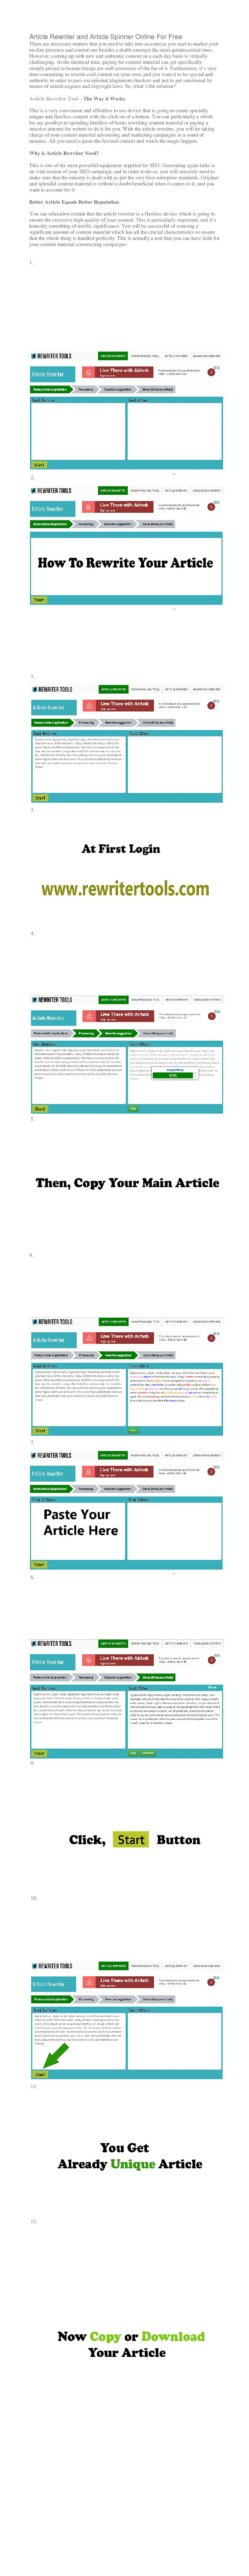 paper writing services legitimate work